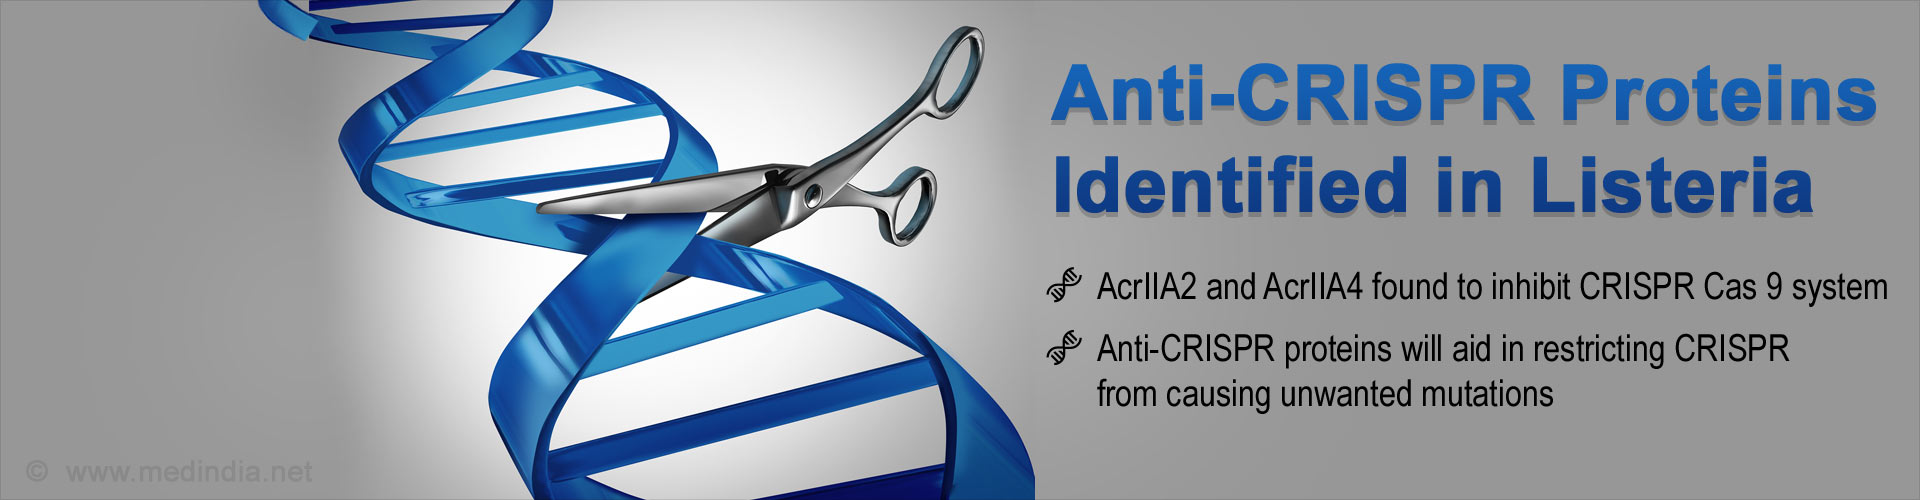 Anti-CRISPR Proteins Identified to Control Gene Editing Tool CRISPR